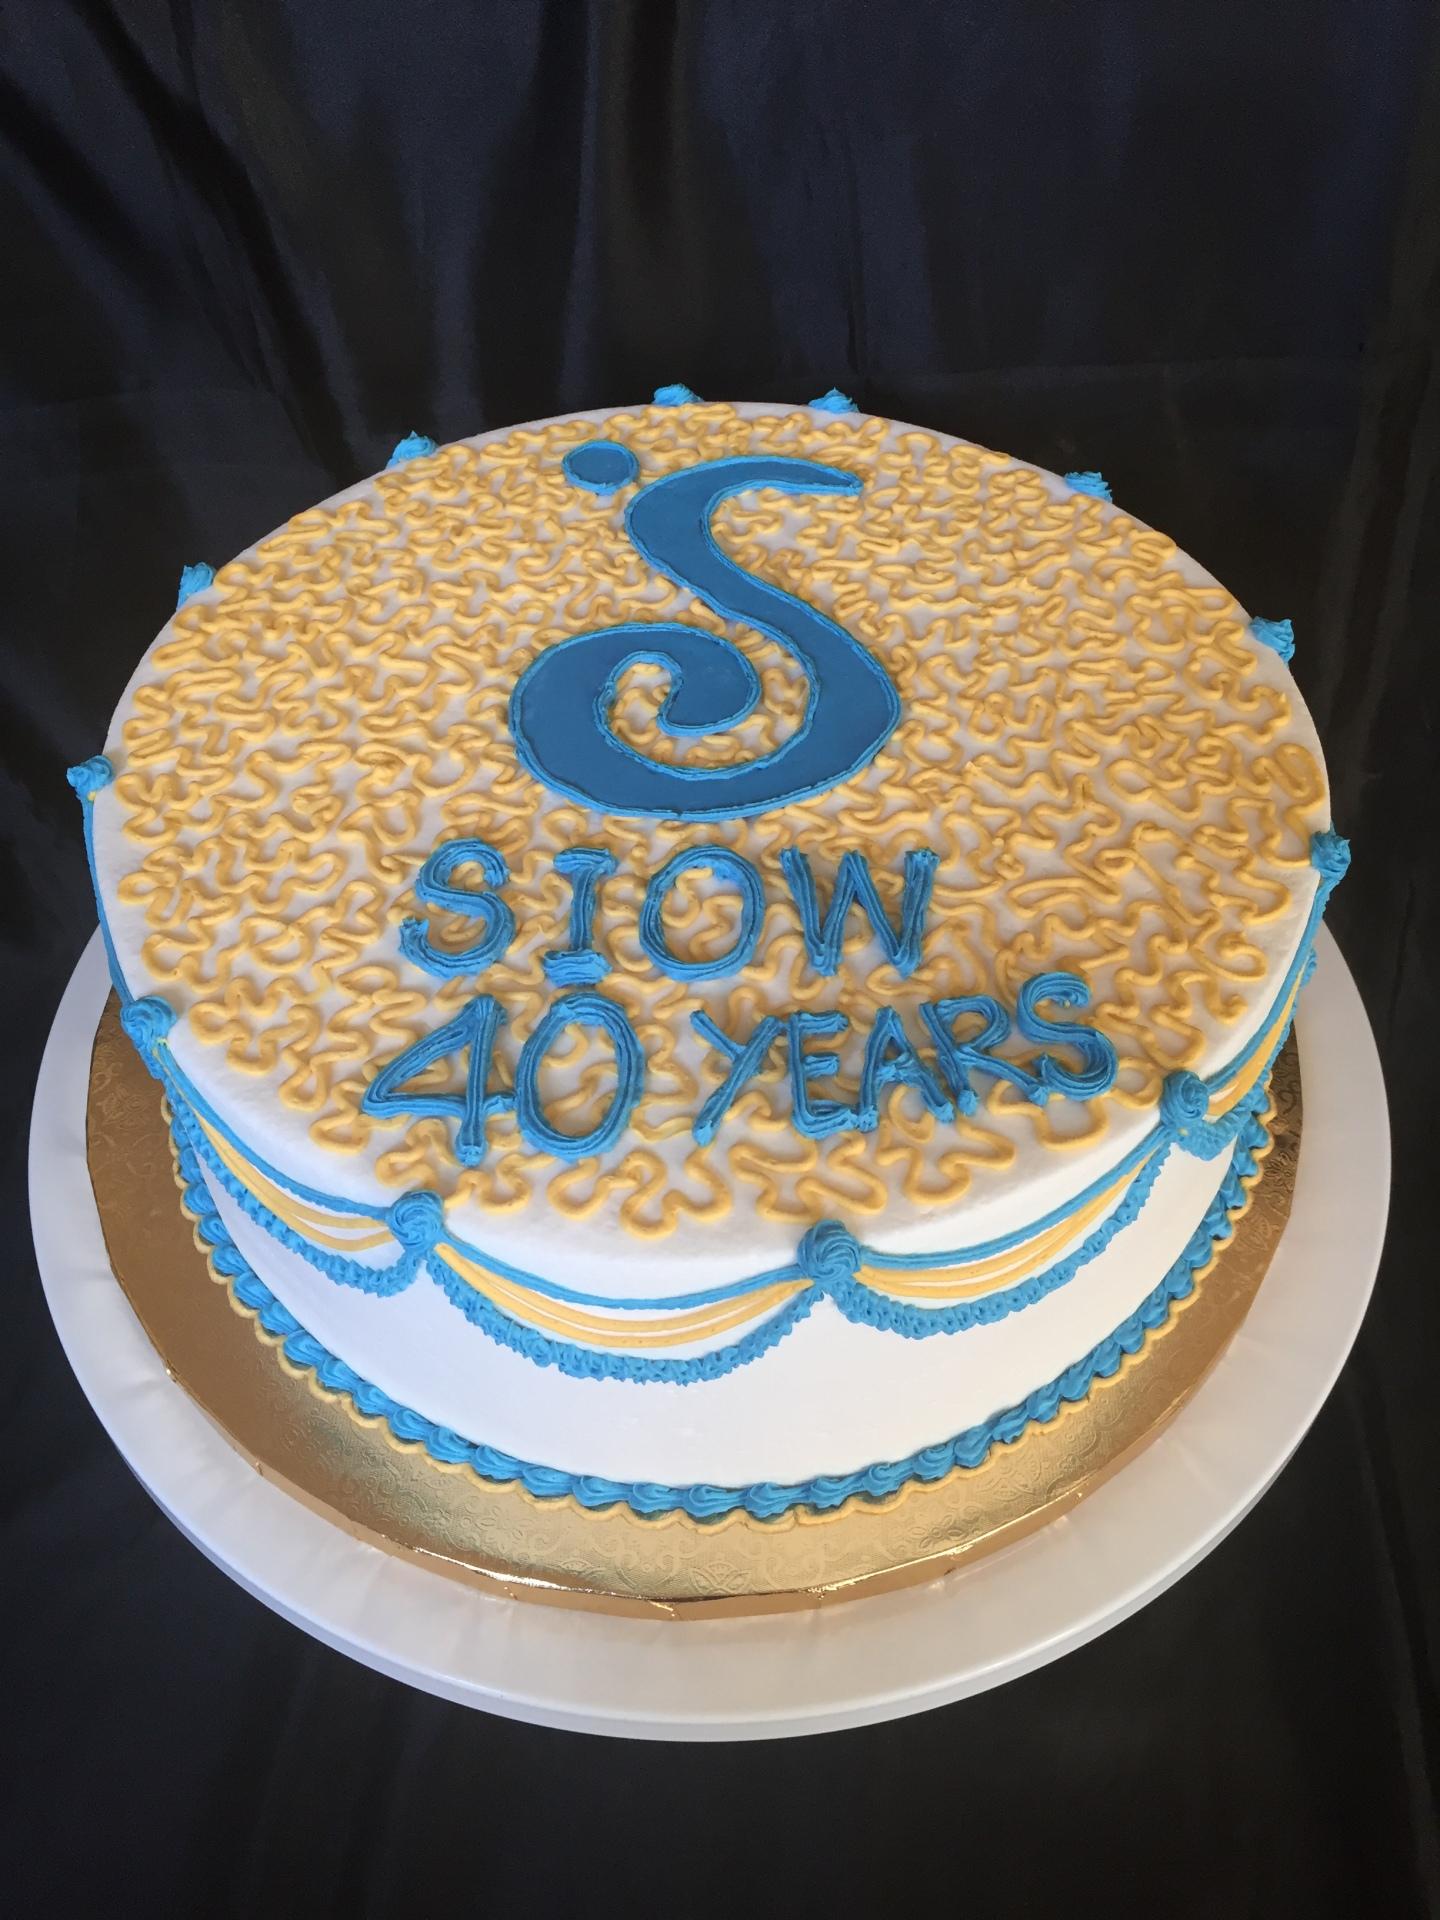 Soroptimist 40th anniversary cake